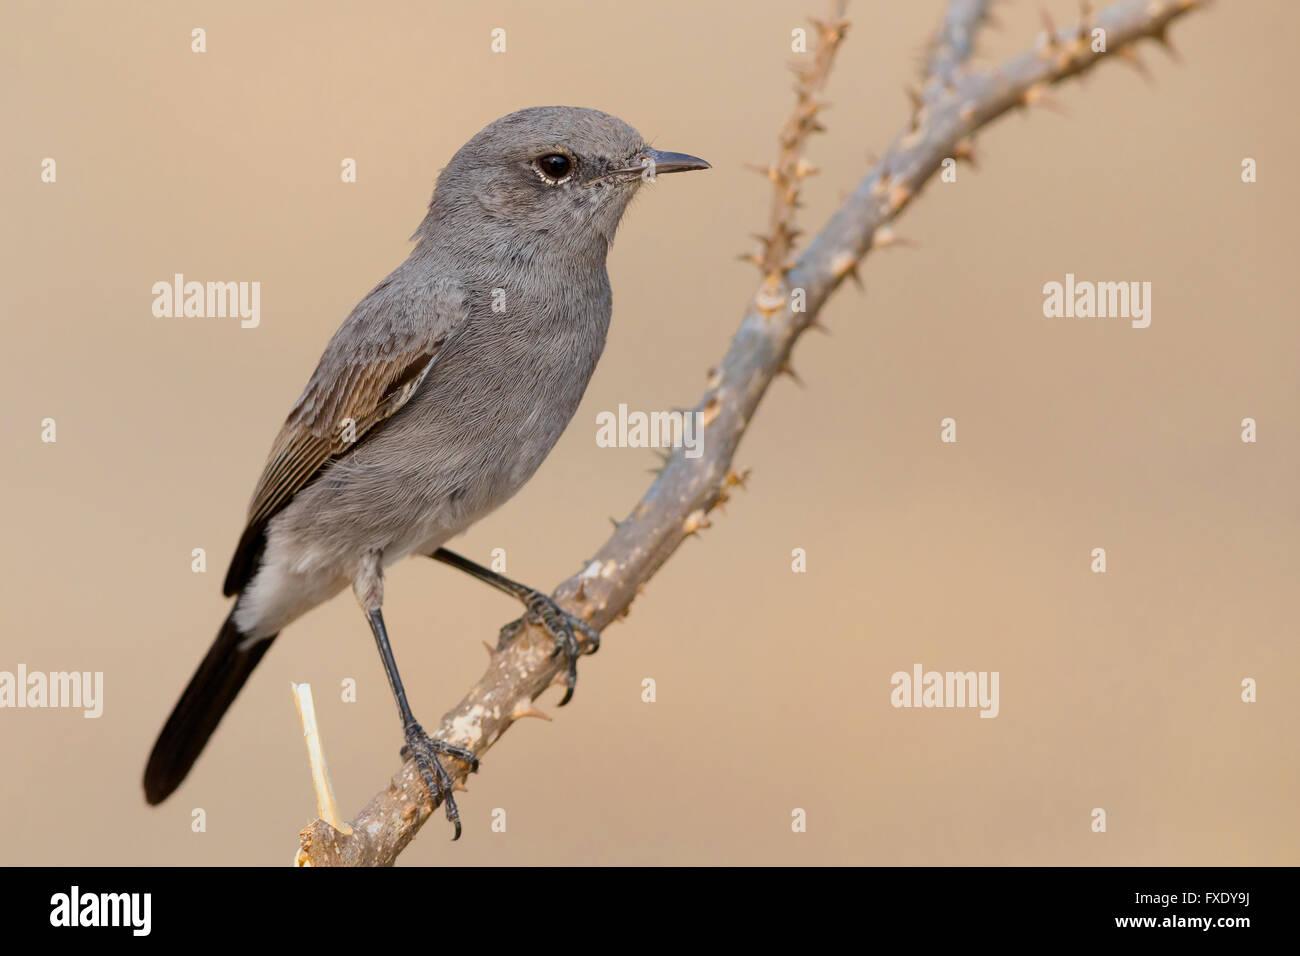 Blackstart (Oenanthe melanura), perched on a twig, Ayn Hamran, Dhofar, Oman - Stock Image